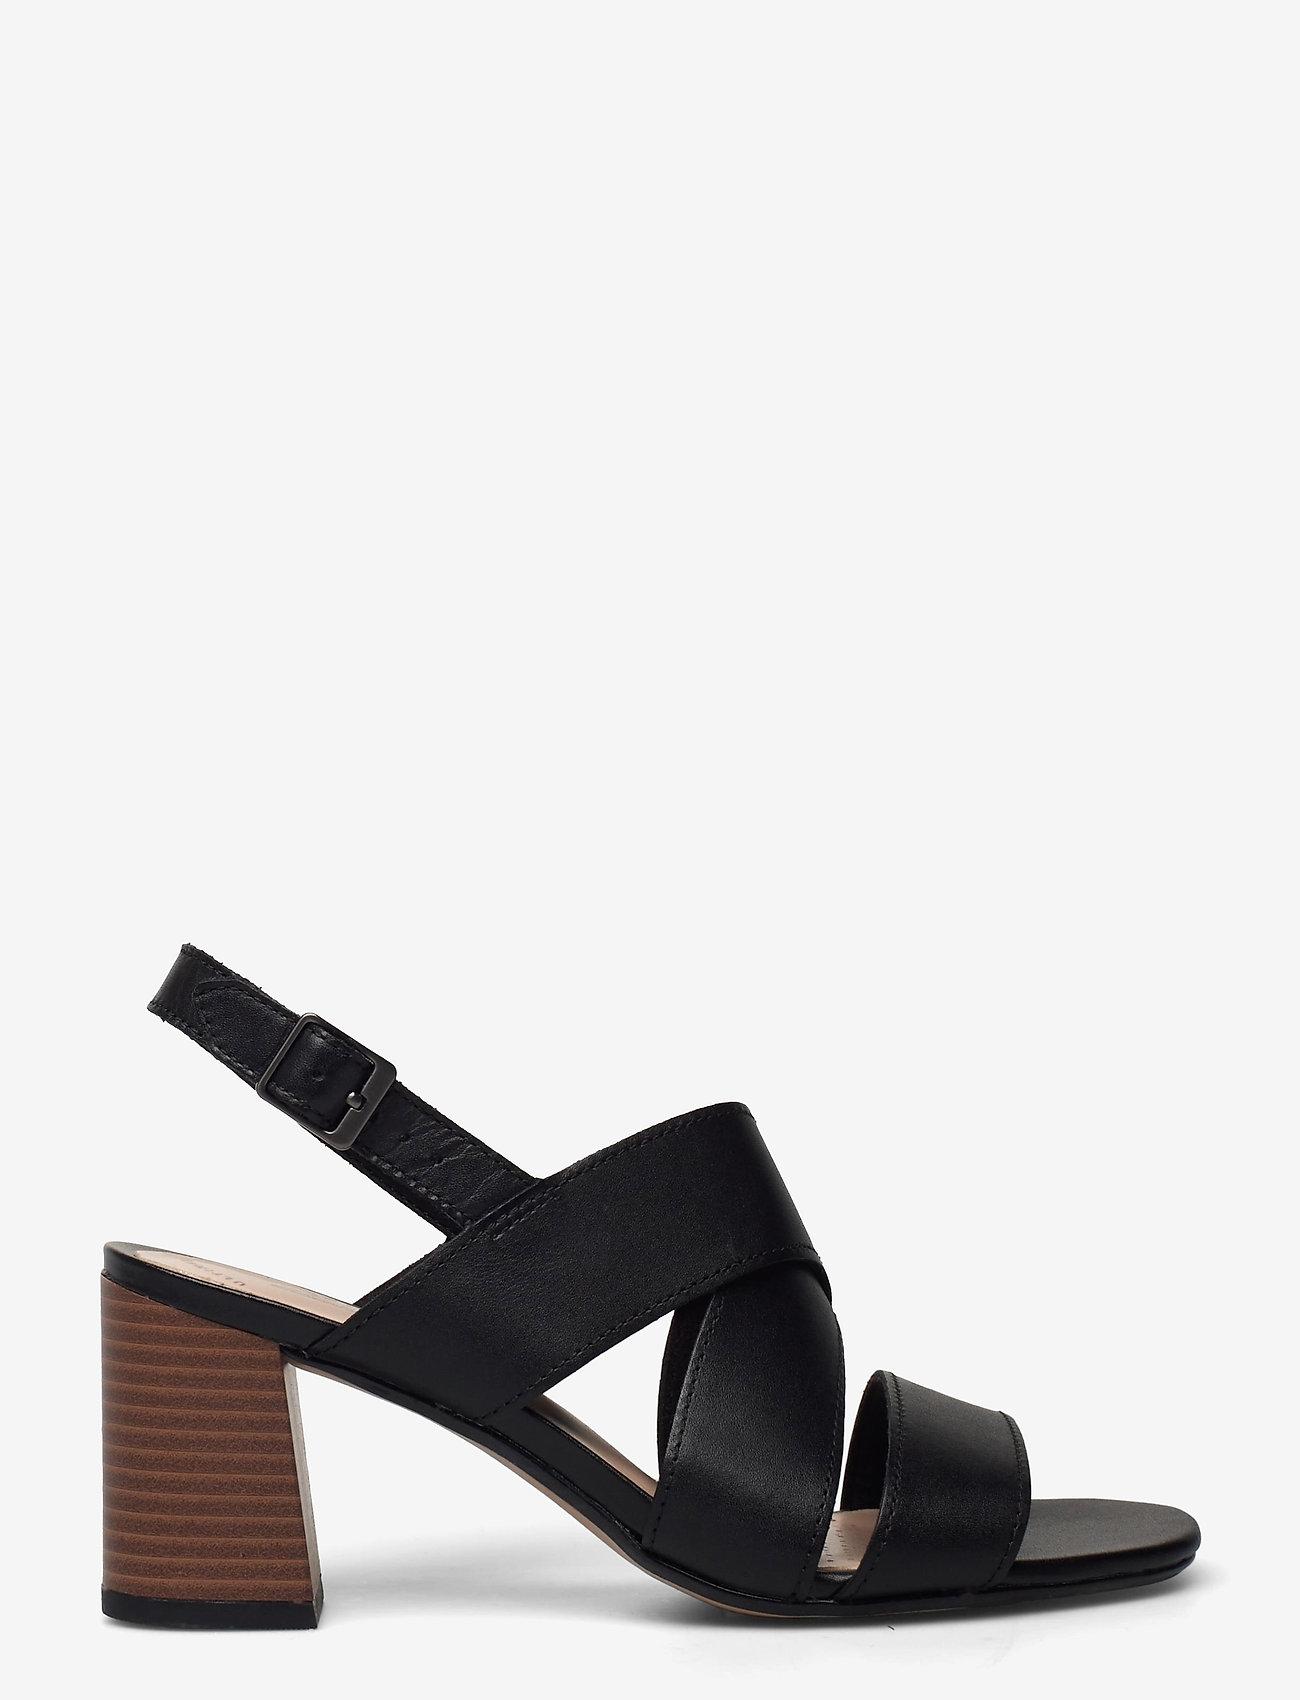 Clarks - Jocelynne Bao - sandales à talons - black leather - 1